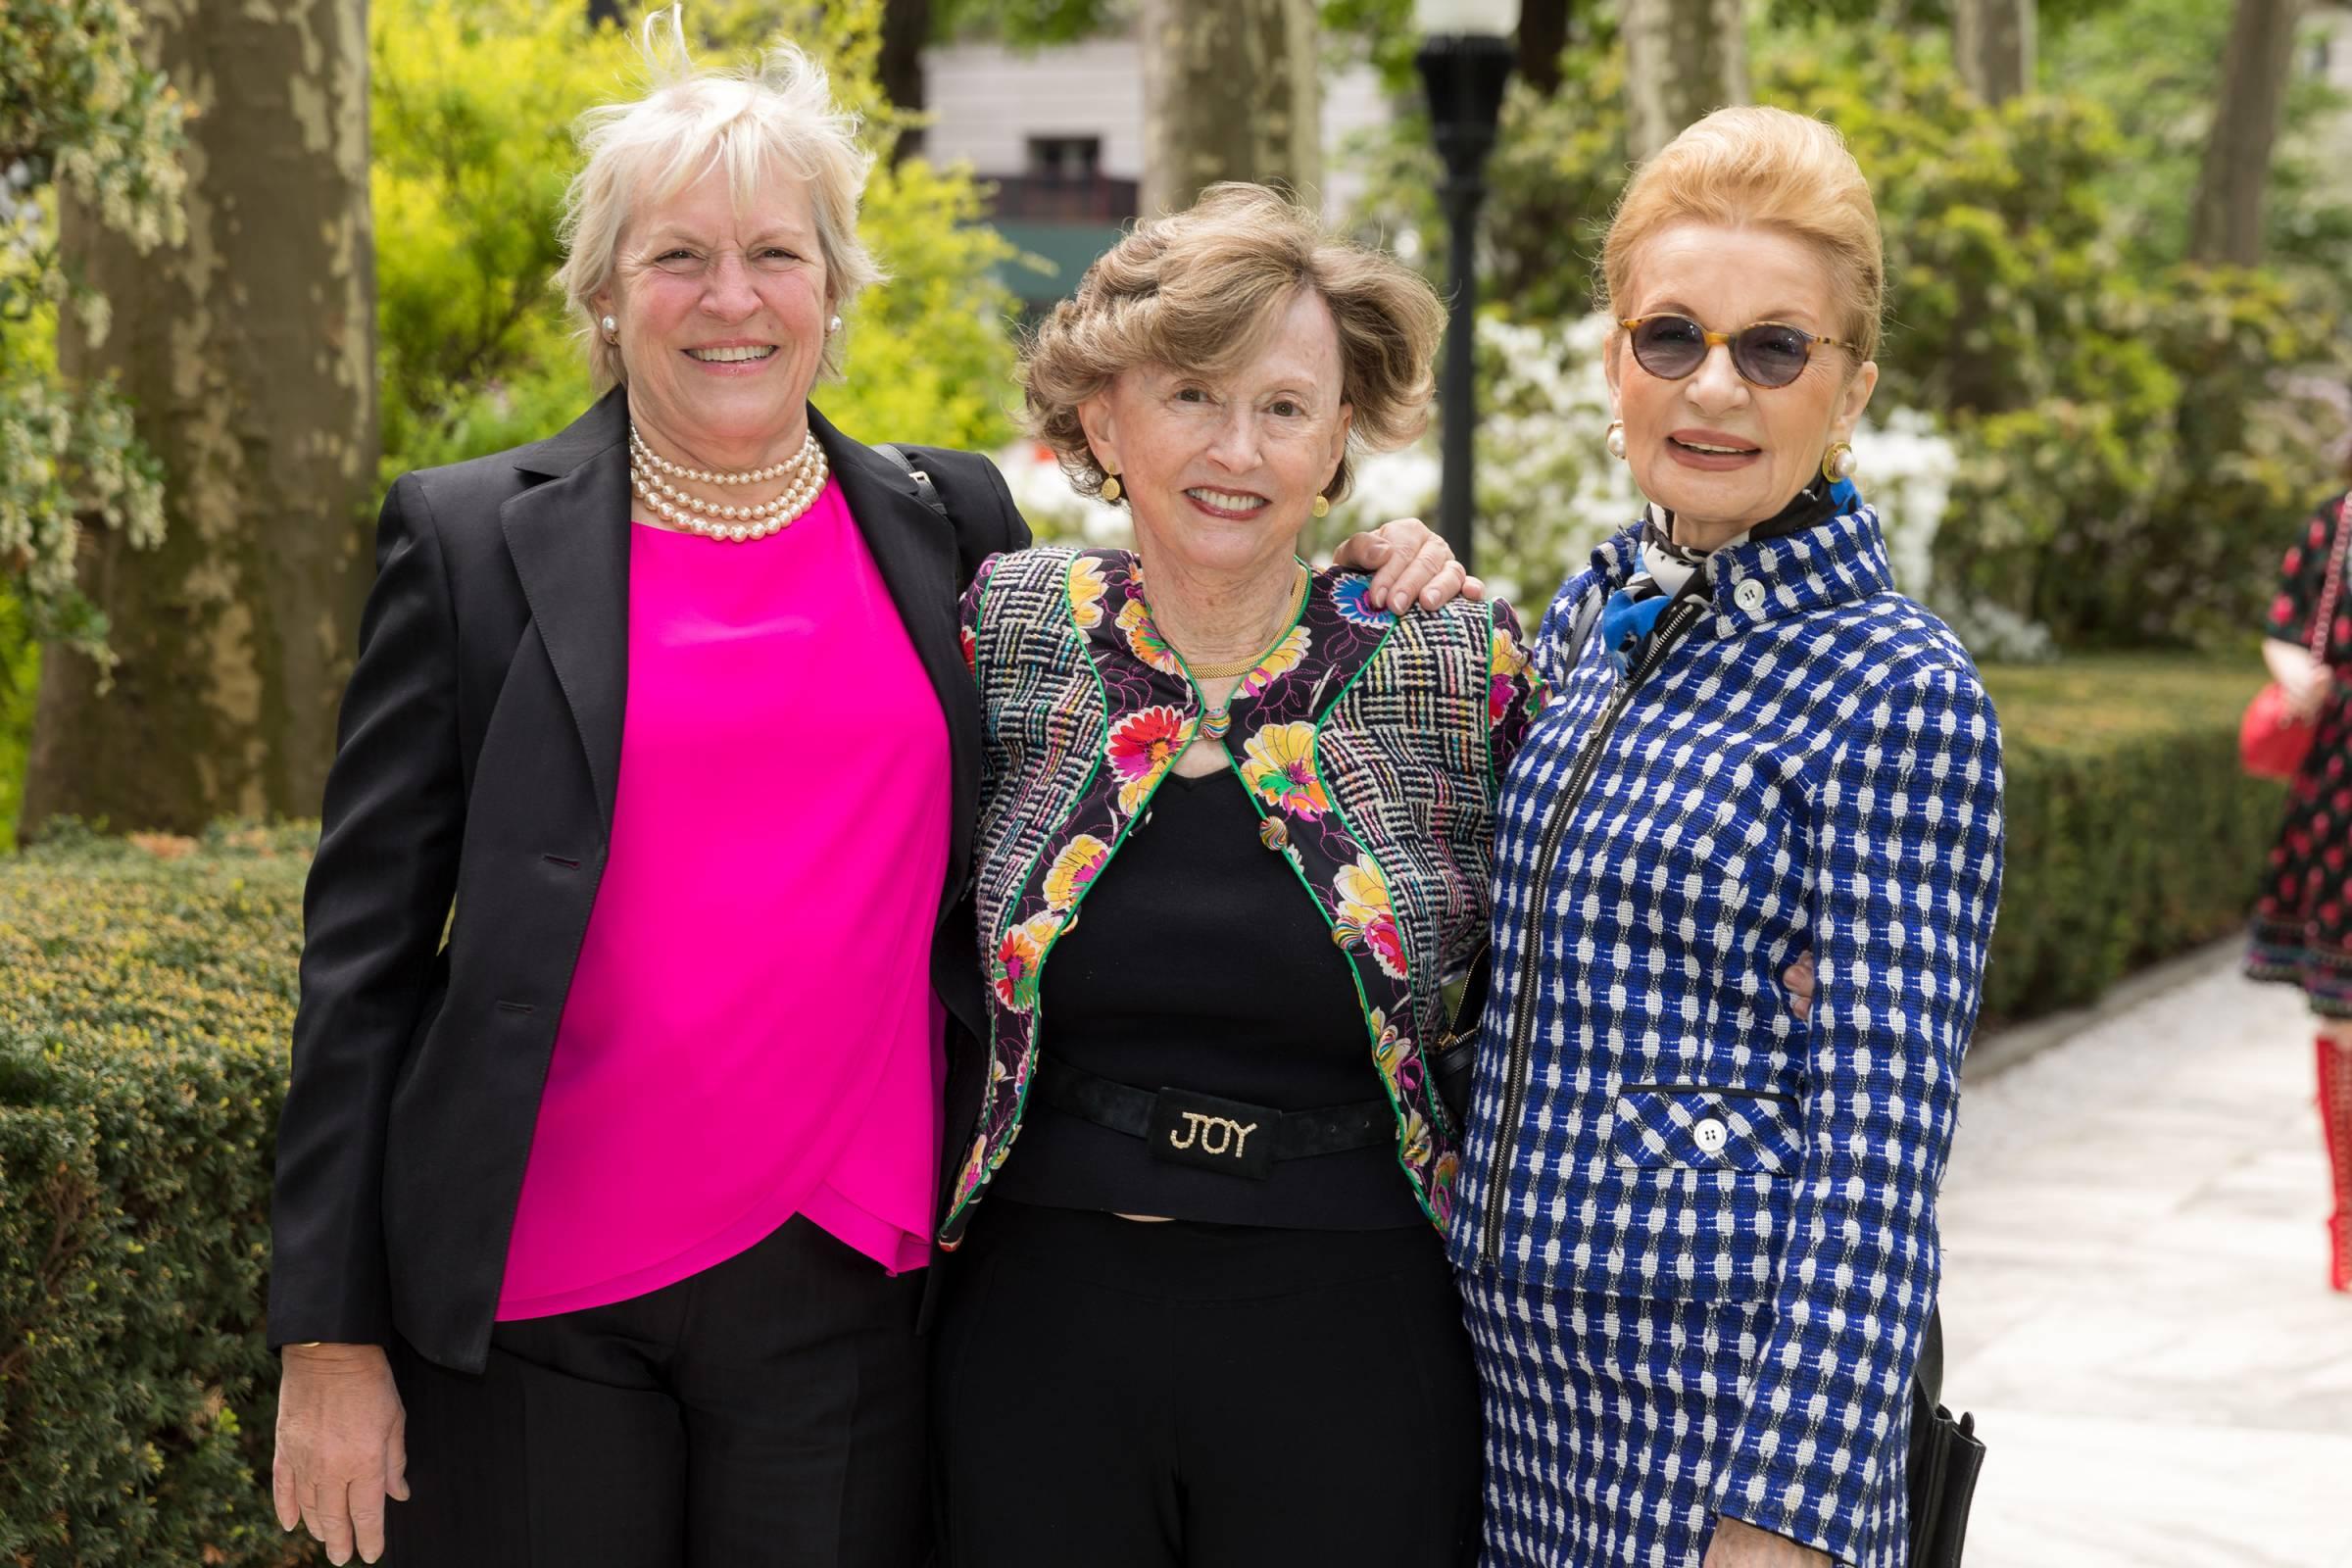 Bonnie Johnson, Gail Hunt Reeke, Elaine Arace